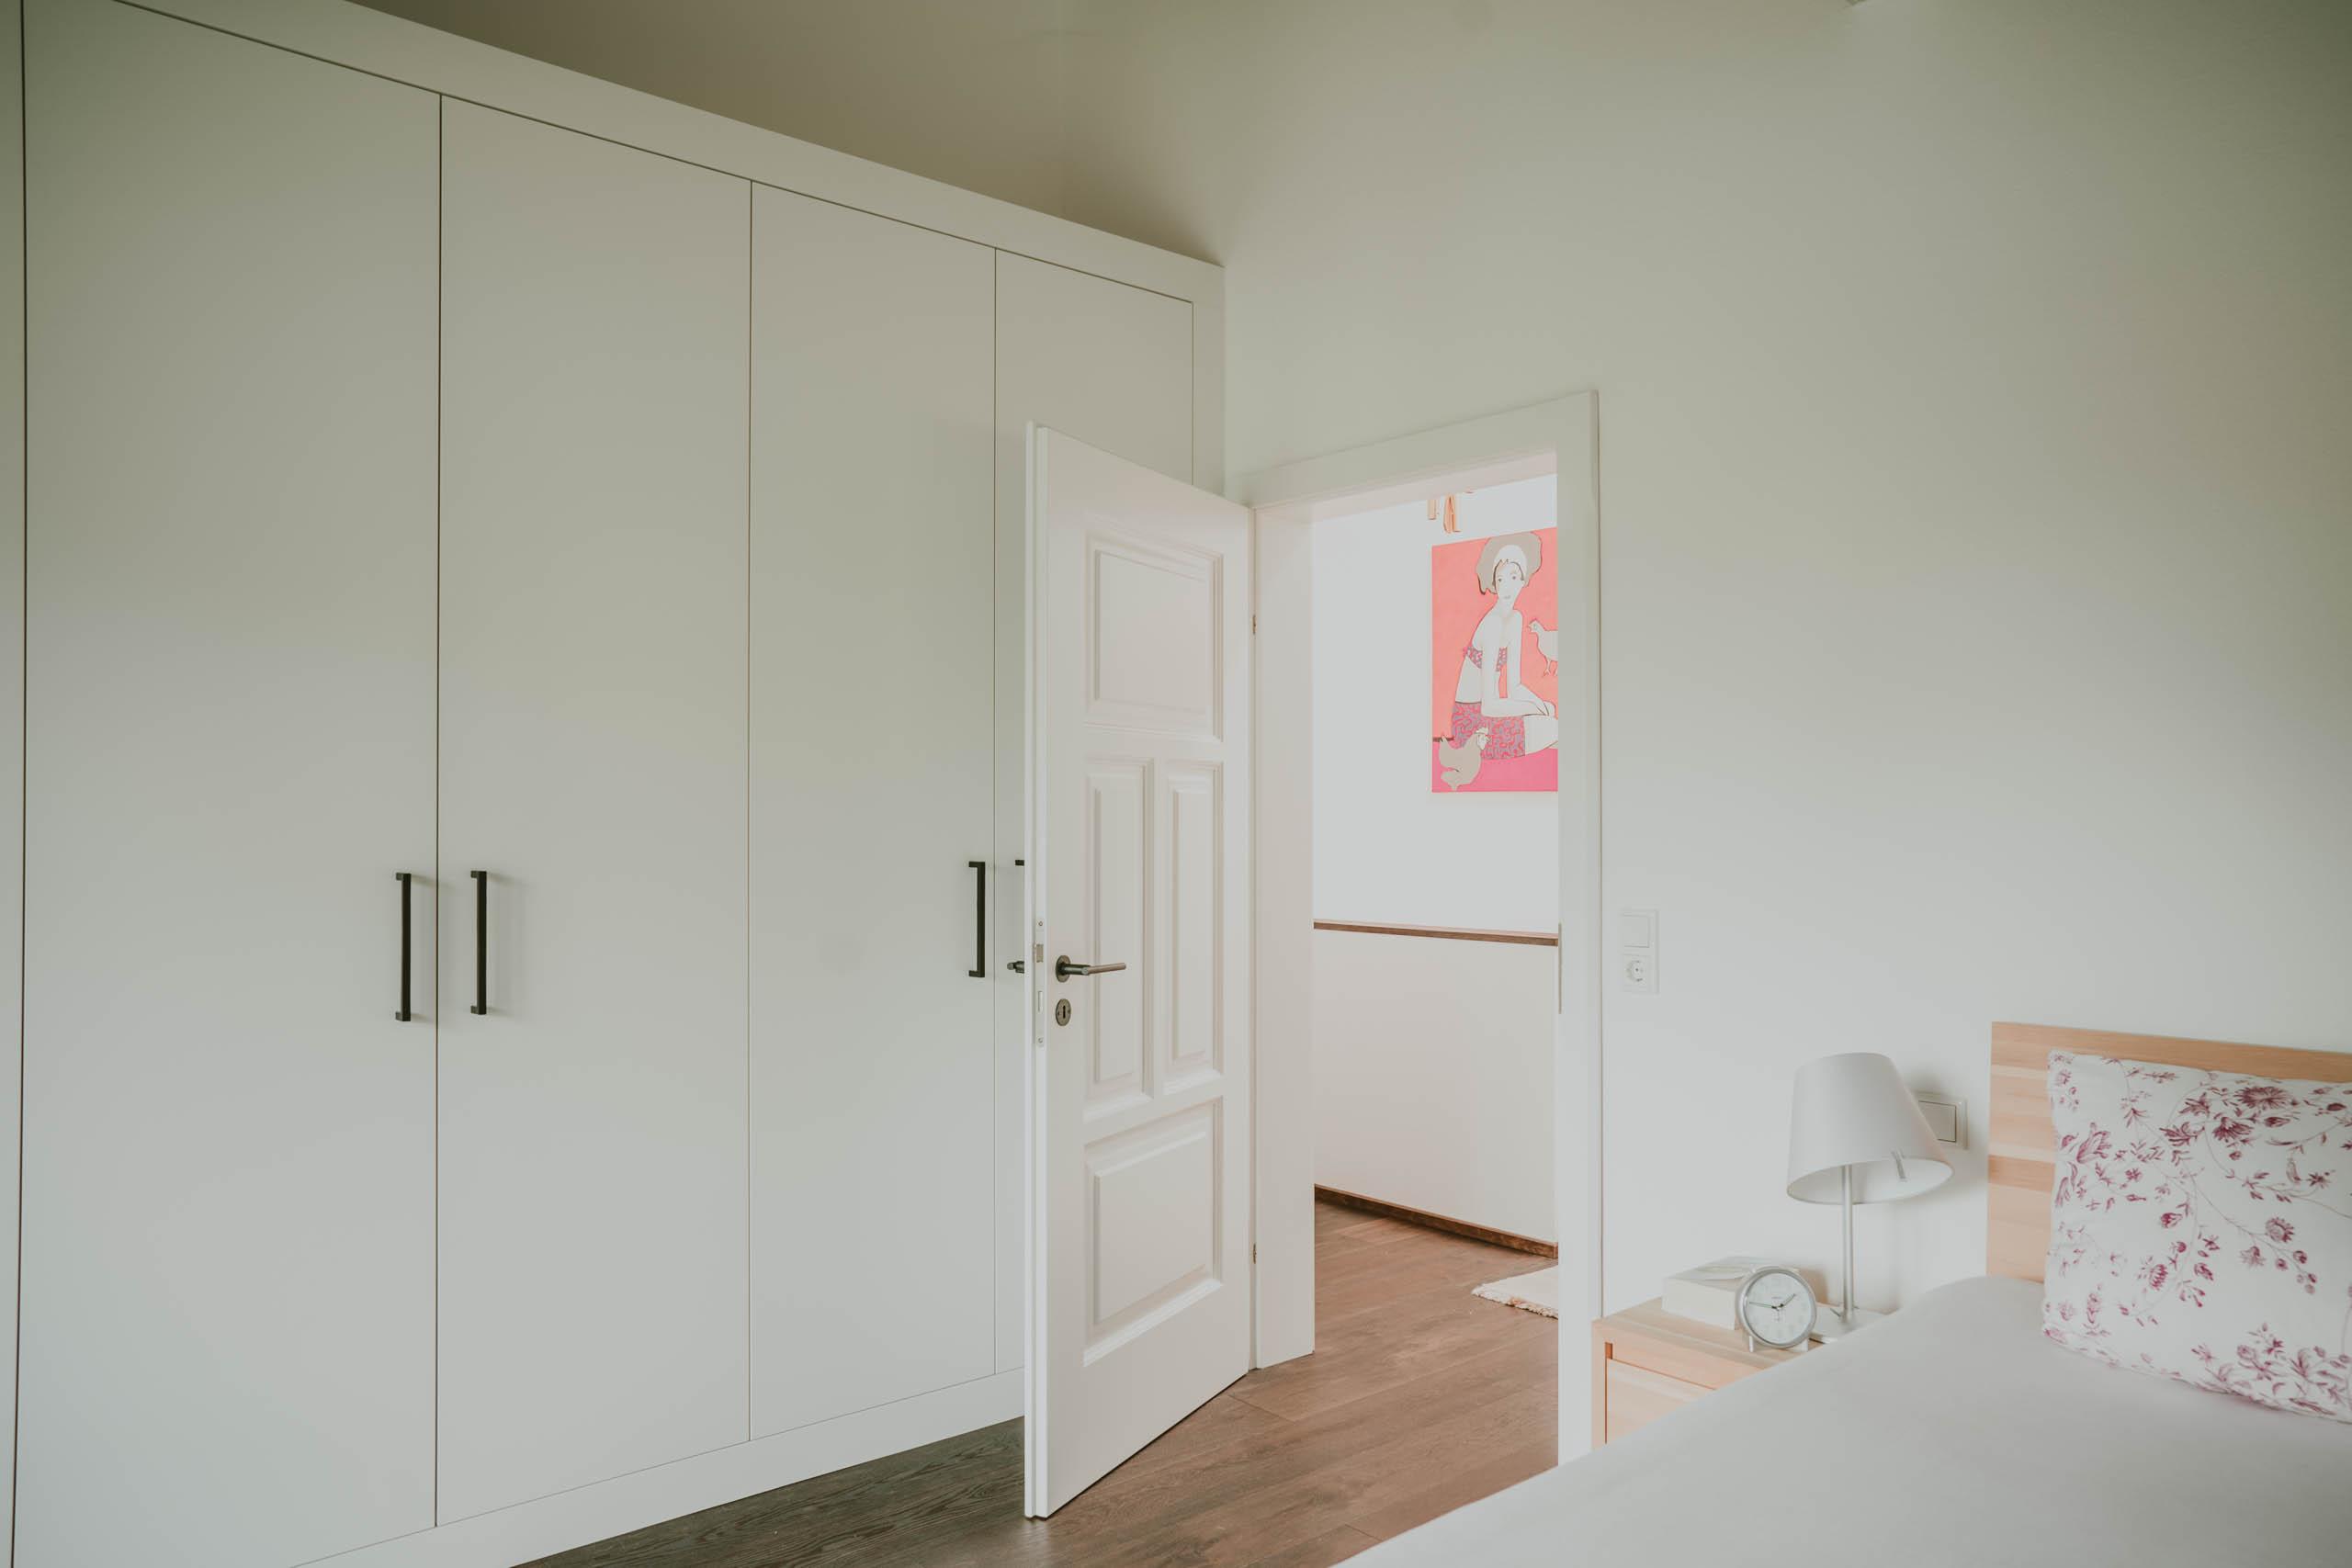 20210521 paula buchner innenarchitektur haus im chiemgau by andreamittermeier 9AM06412